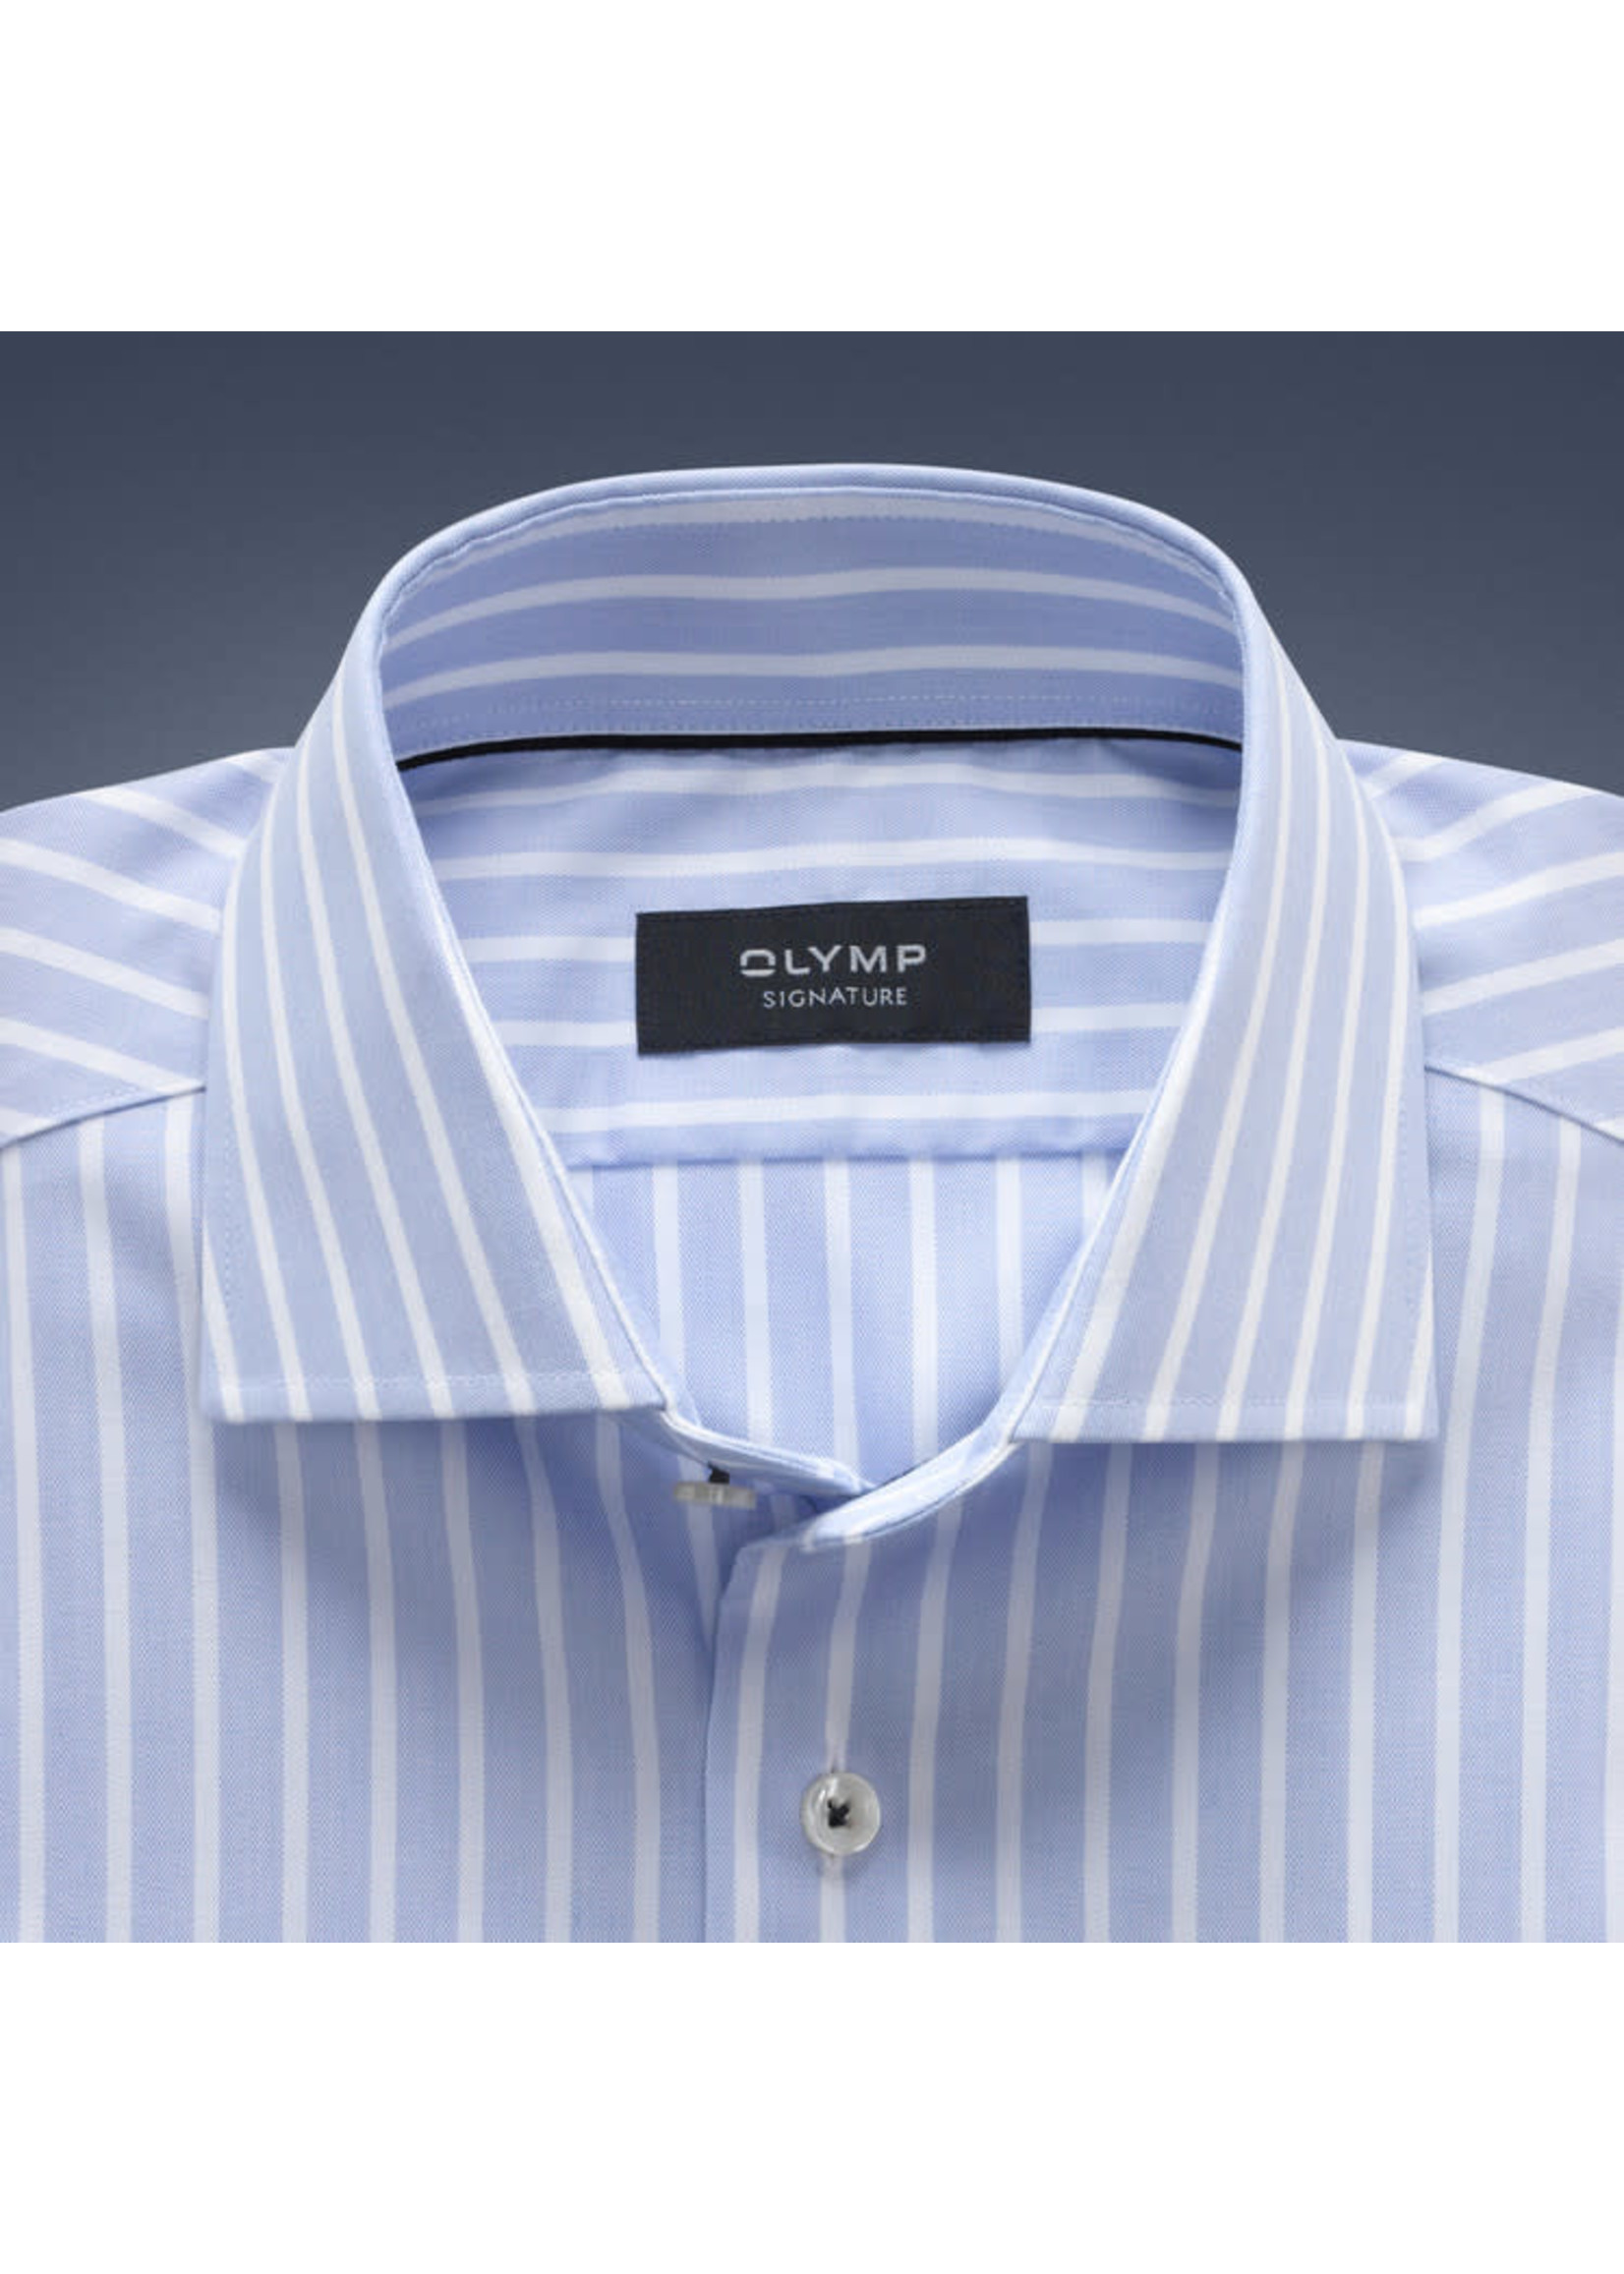 Olymp Signature tailored fit overhemd lichtblauw streep